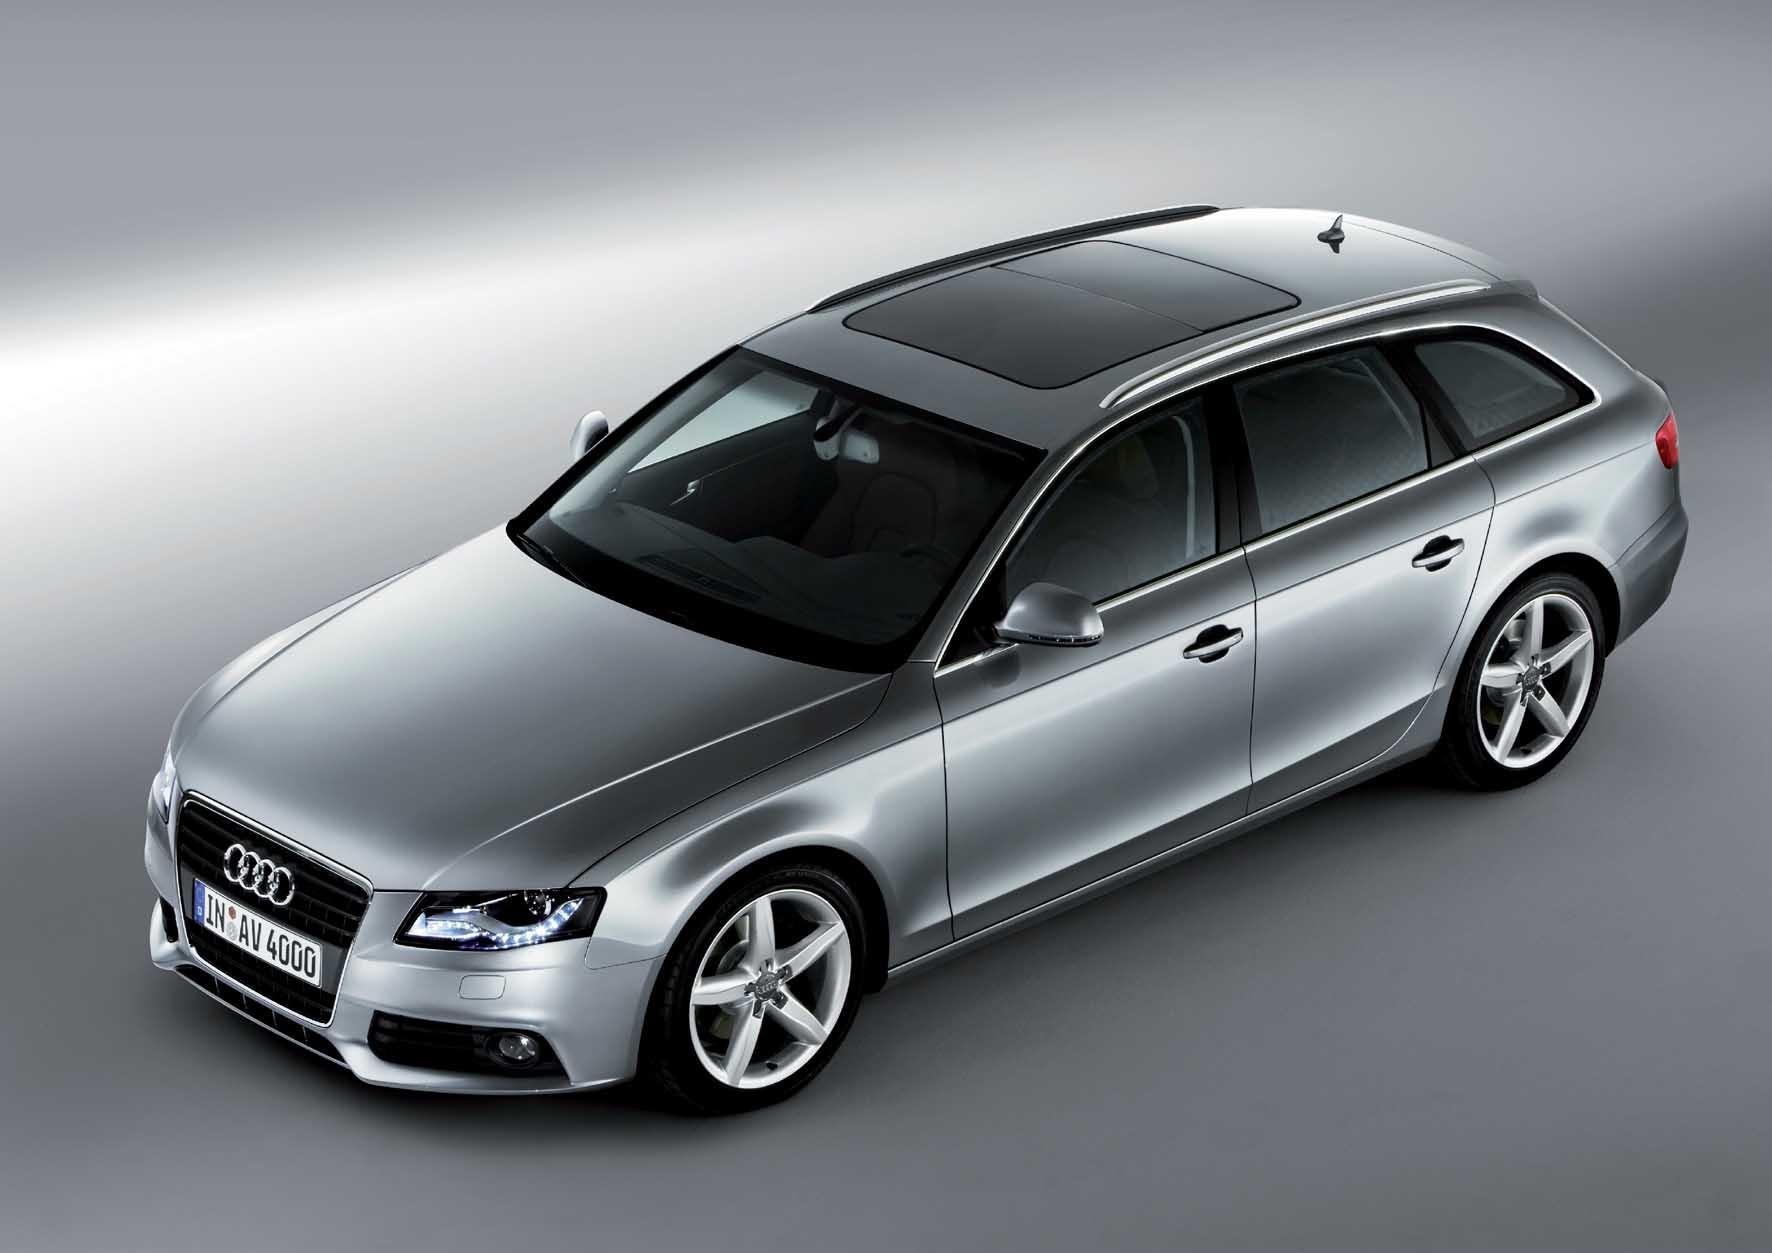 Audi 2008 nuova A4 Avant frontlat alto 1